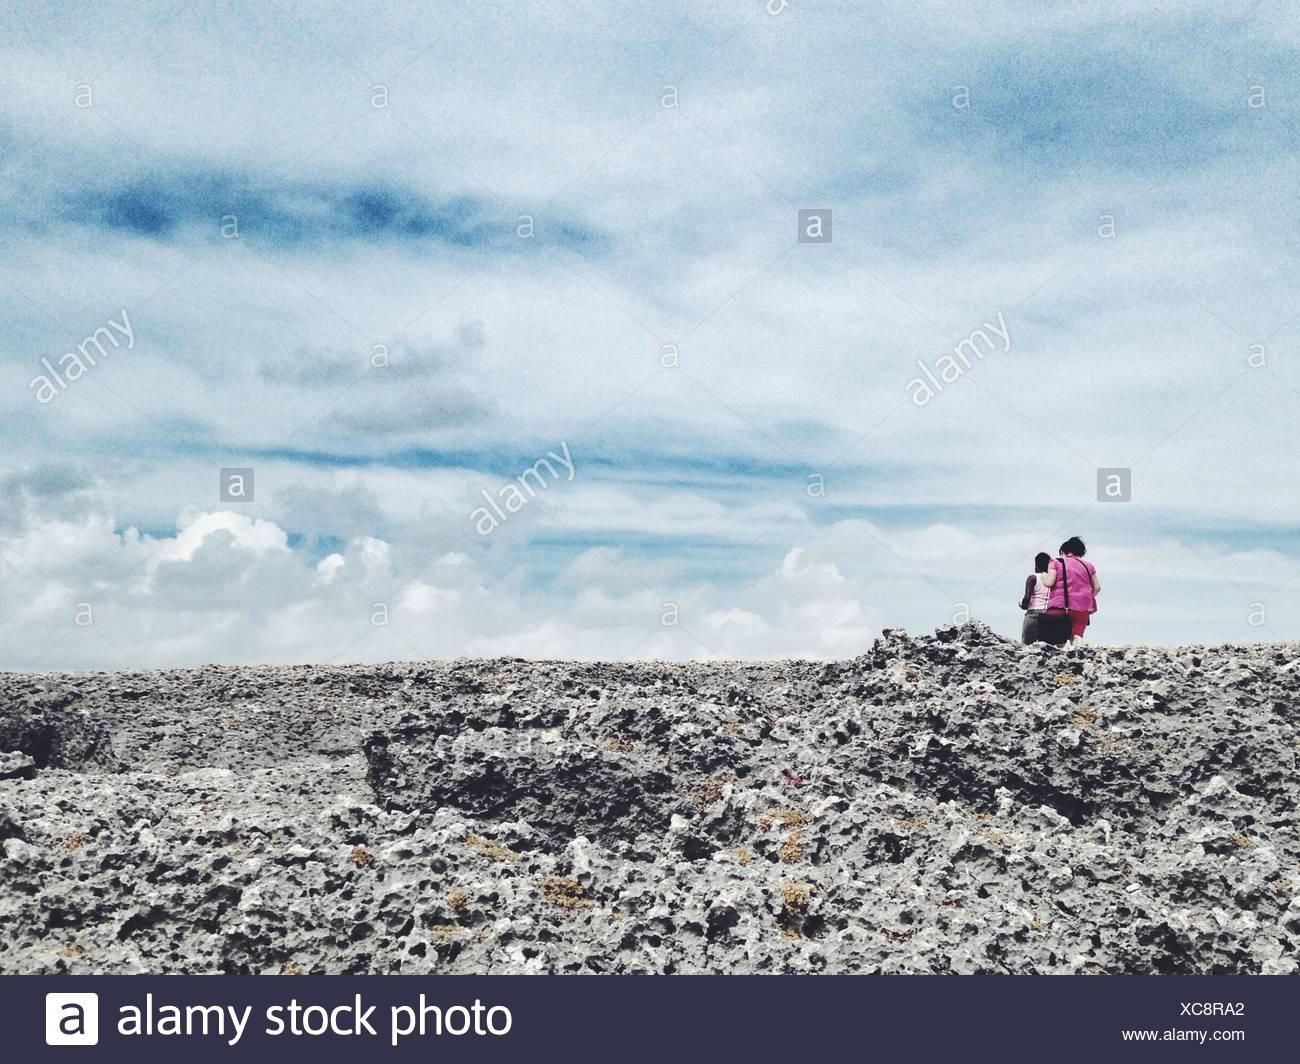 Sky Over Porous Rocks Stock Photo